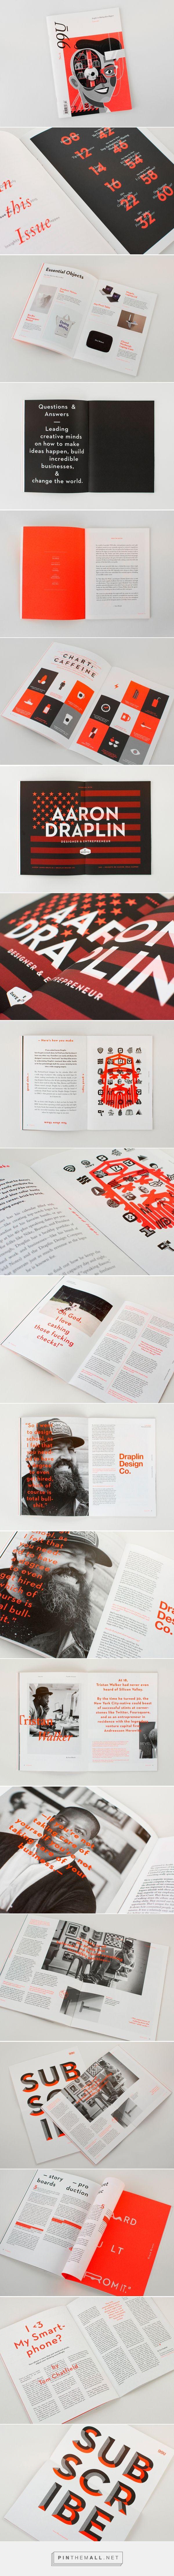 99U Quarterly — Issue 6 on Behance - created via https://pinthemall.net